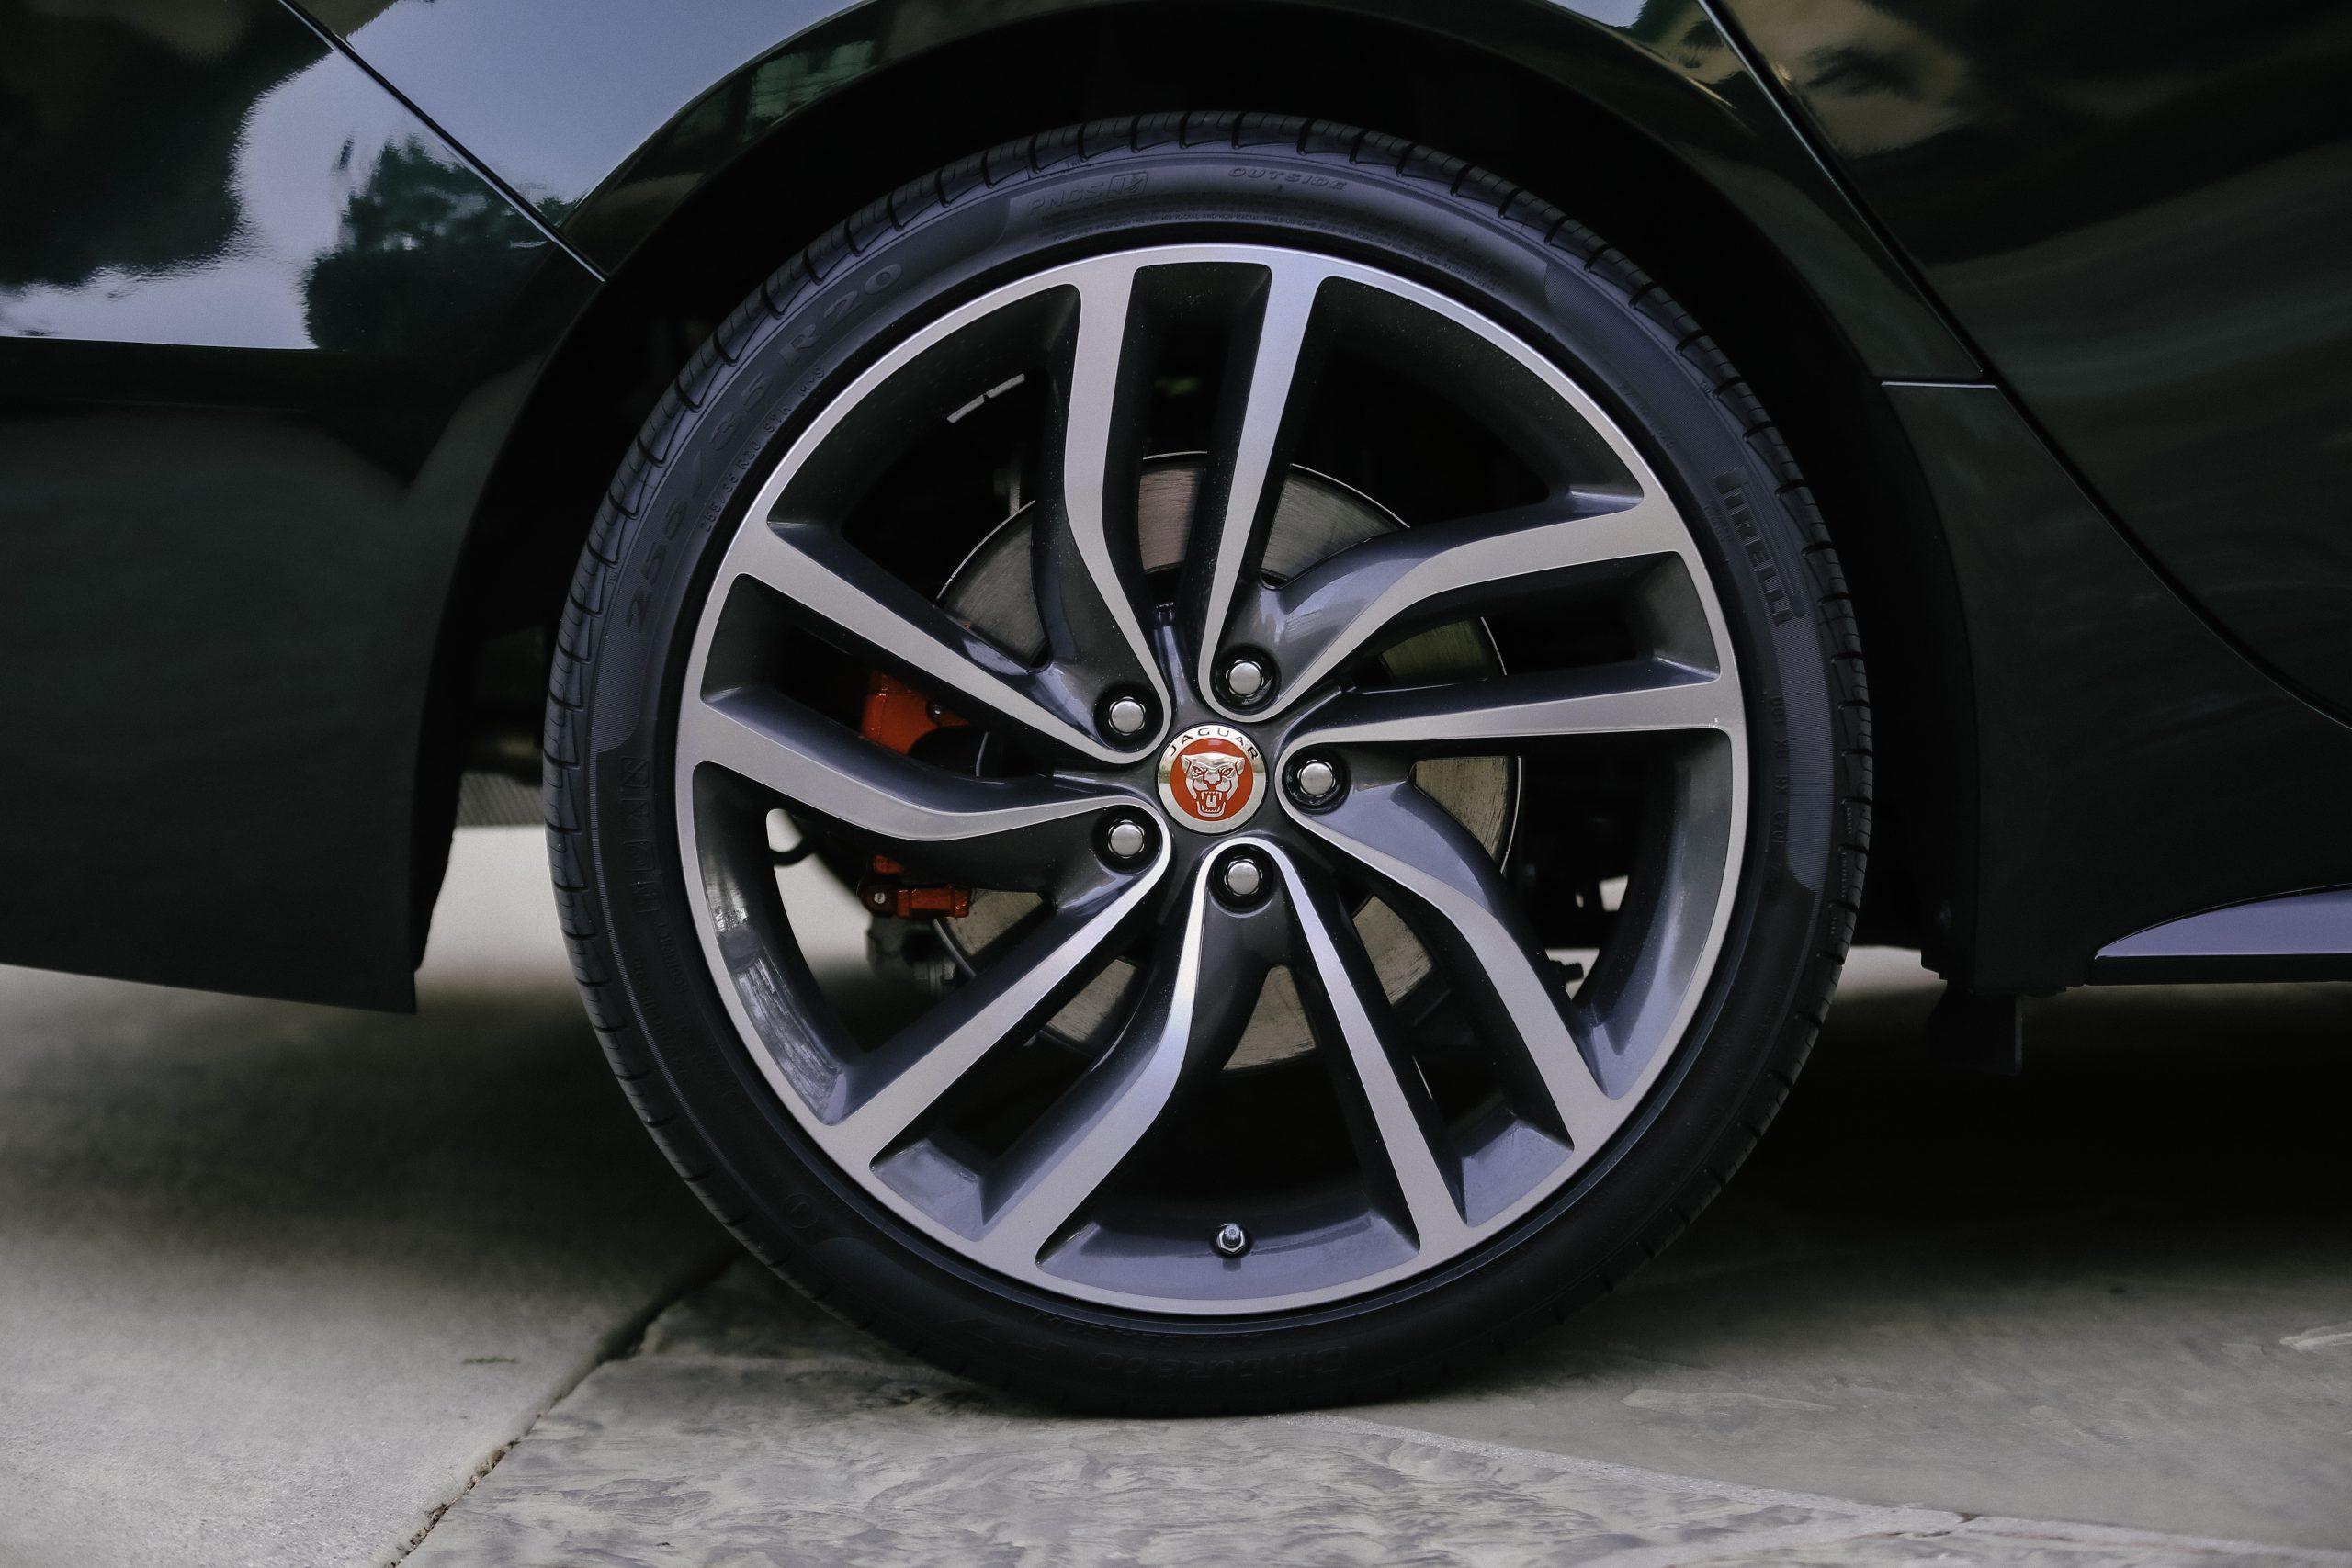 2021 Jaguar XF P300 R-DYNAMIC SE wheel